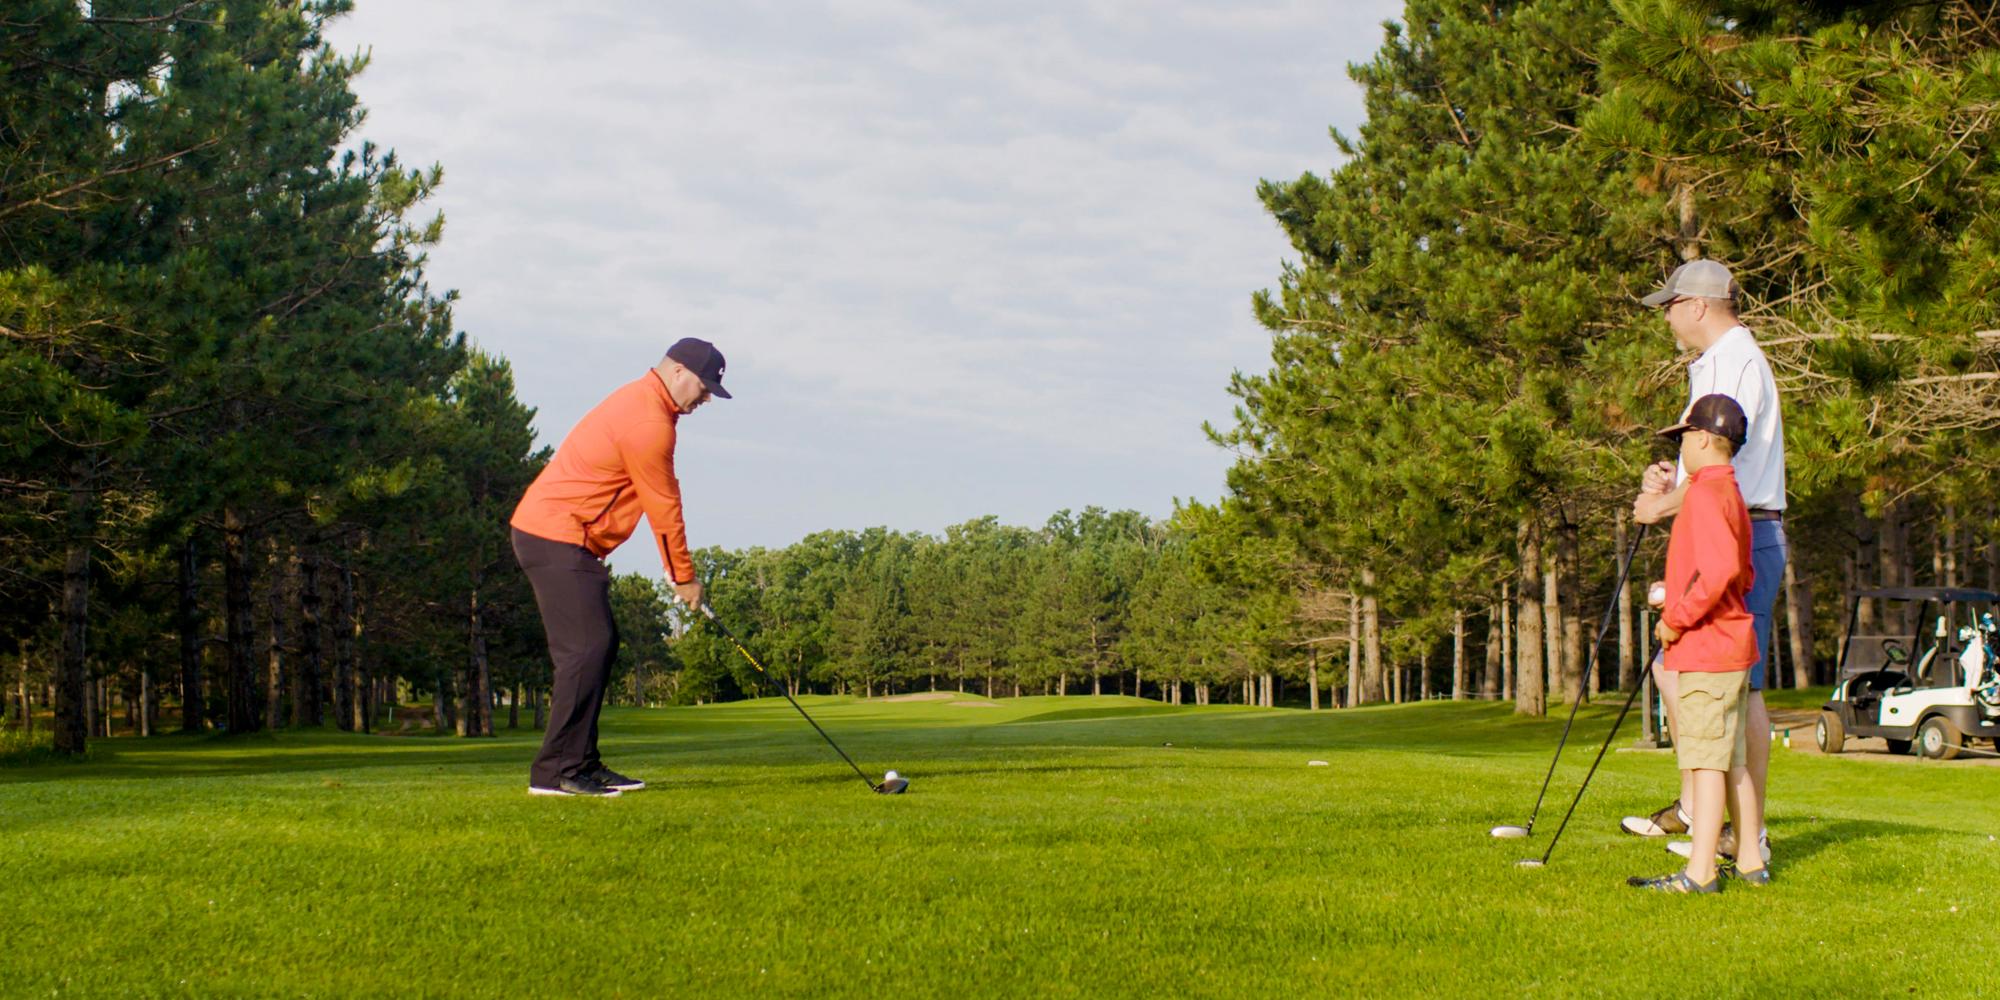 otlca web golf 2kx1k - 1